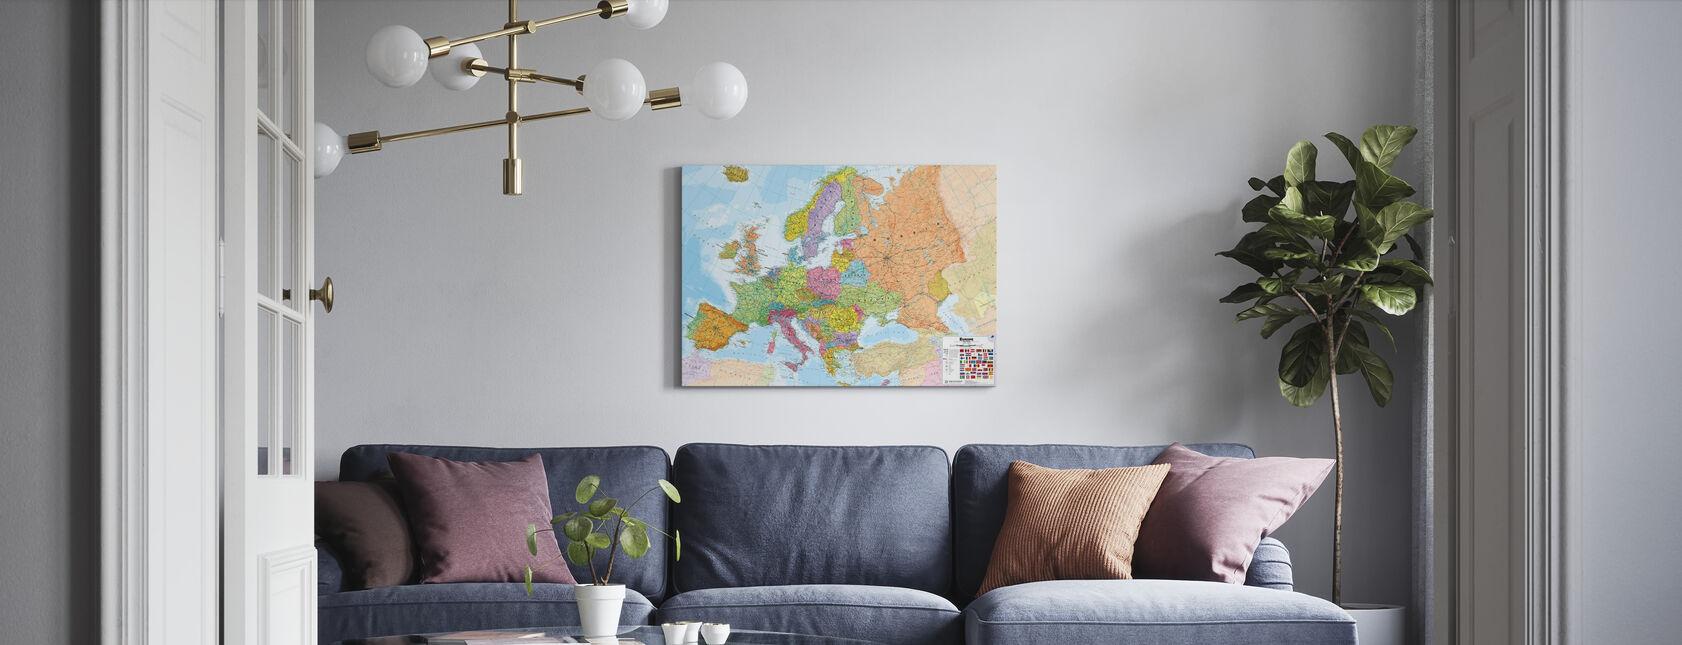 Politiek Europa Kaart - Canvas print - Woonkamer